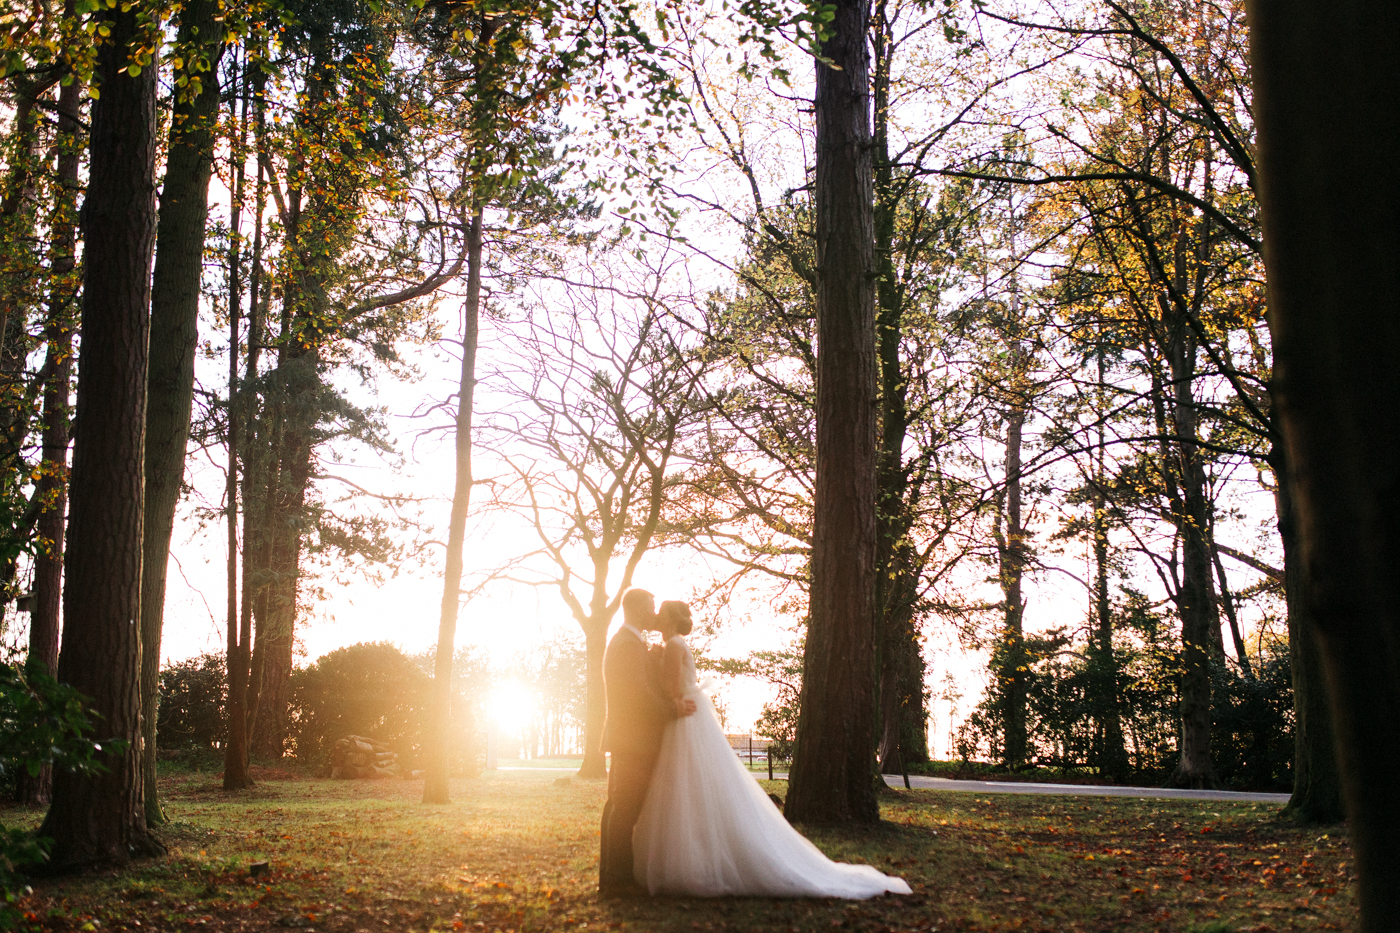 teesside-middlesbrough-north-east-wedding-photographer-creative-wedding-venues-0029.jpg